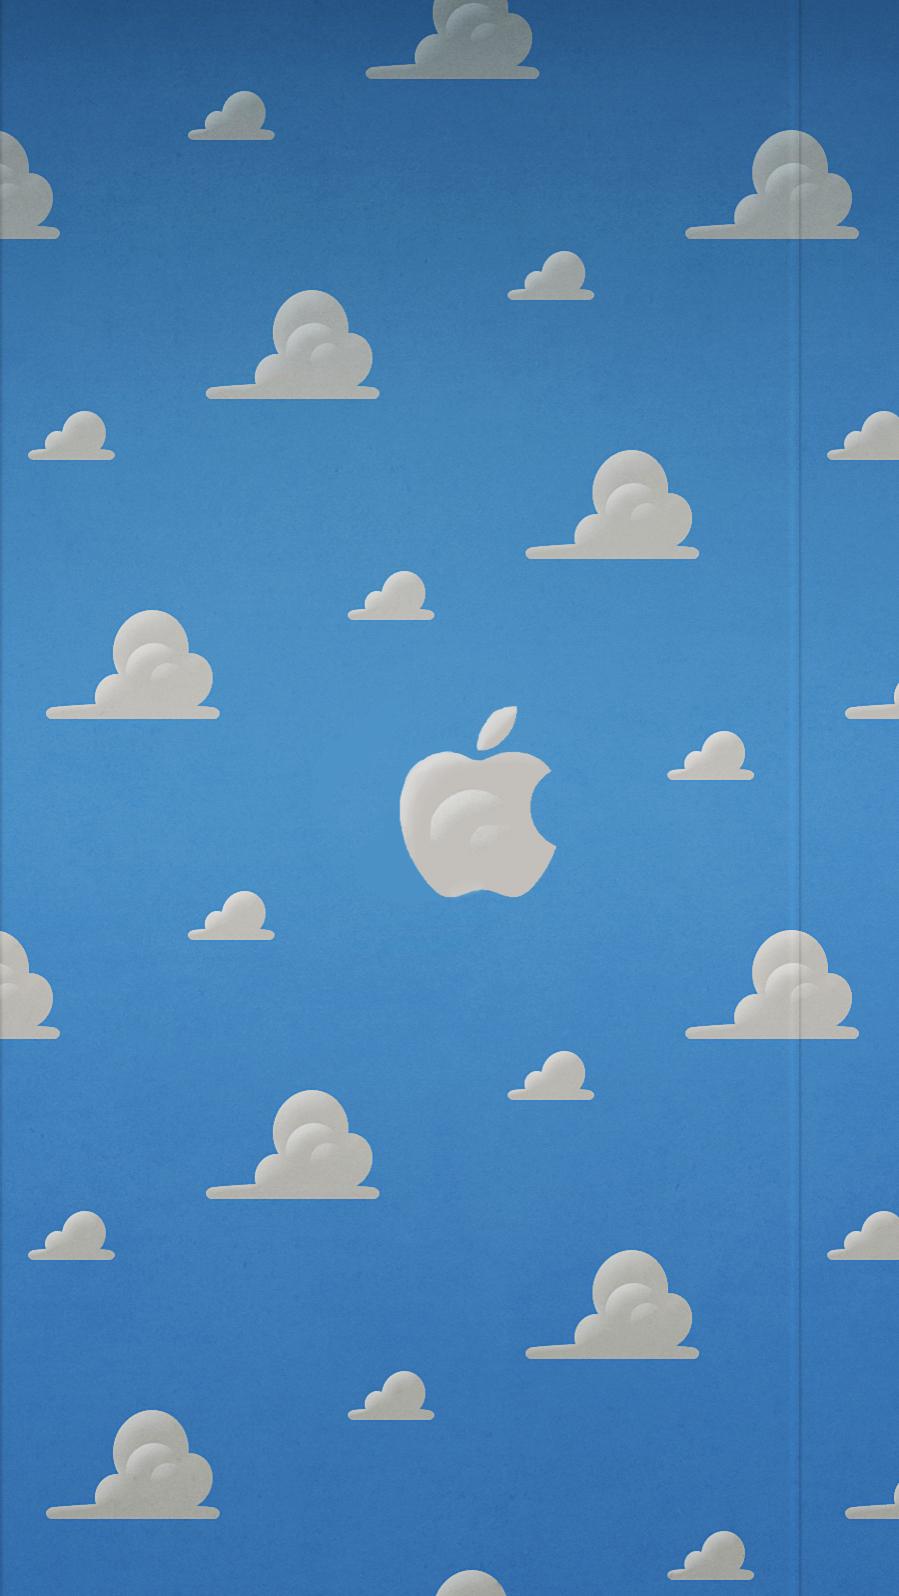 andy 39 s room iphone 5 wallpaper by lindsaycookie on deviantart